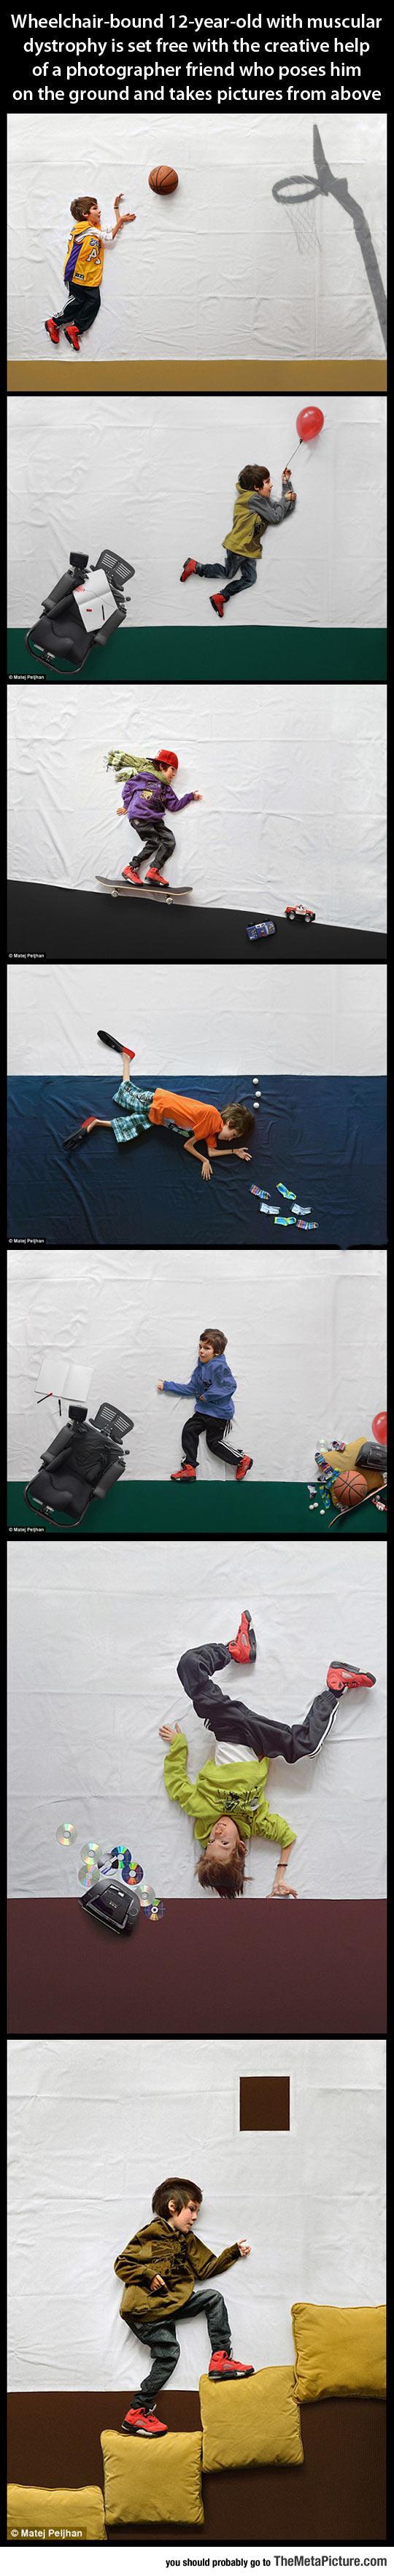 wheelchair-photos-ball-balloon-kid-playing